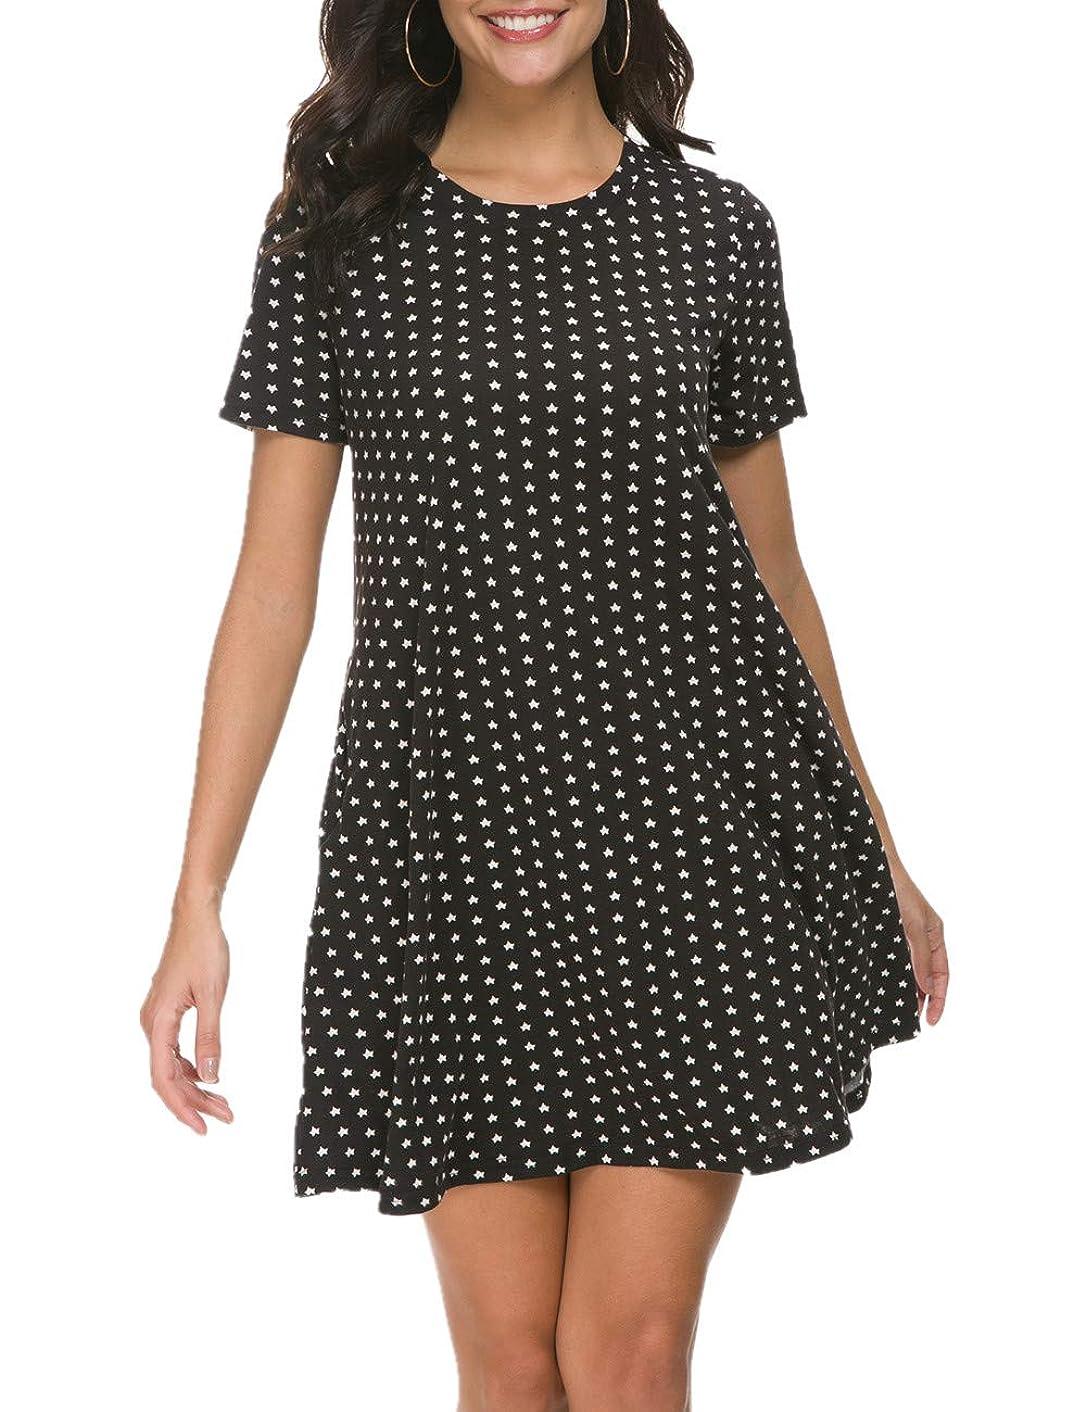 VOBCTY Women's Casual Scoop Neck Short Sleeve Swing T-Shirt Dresses